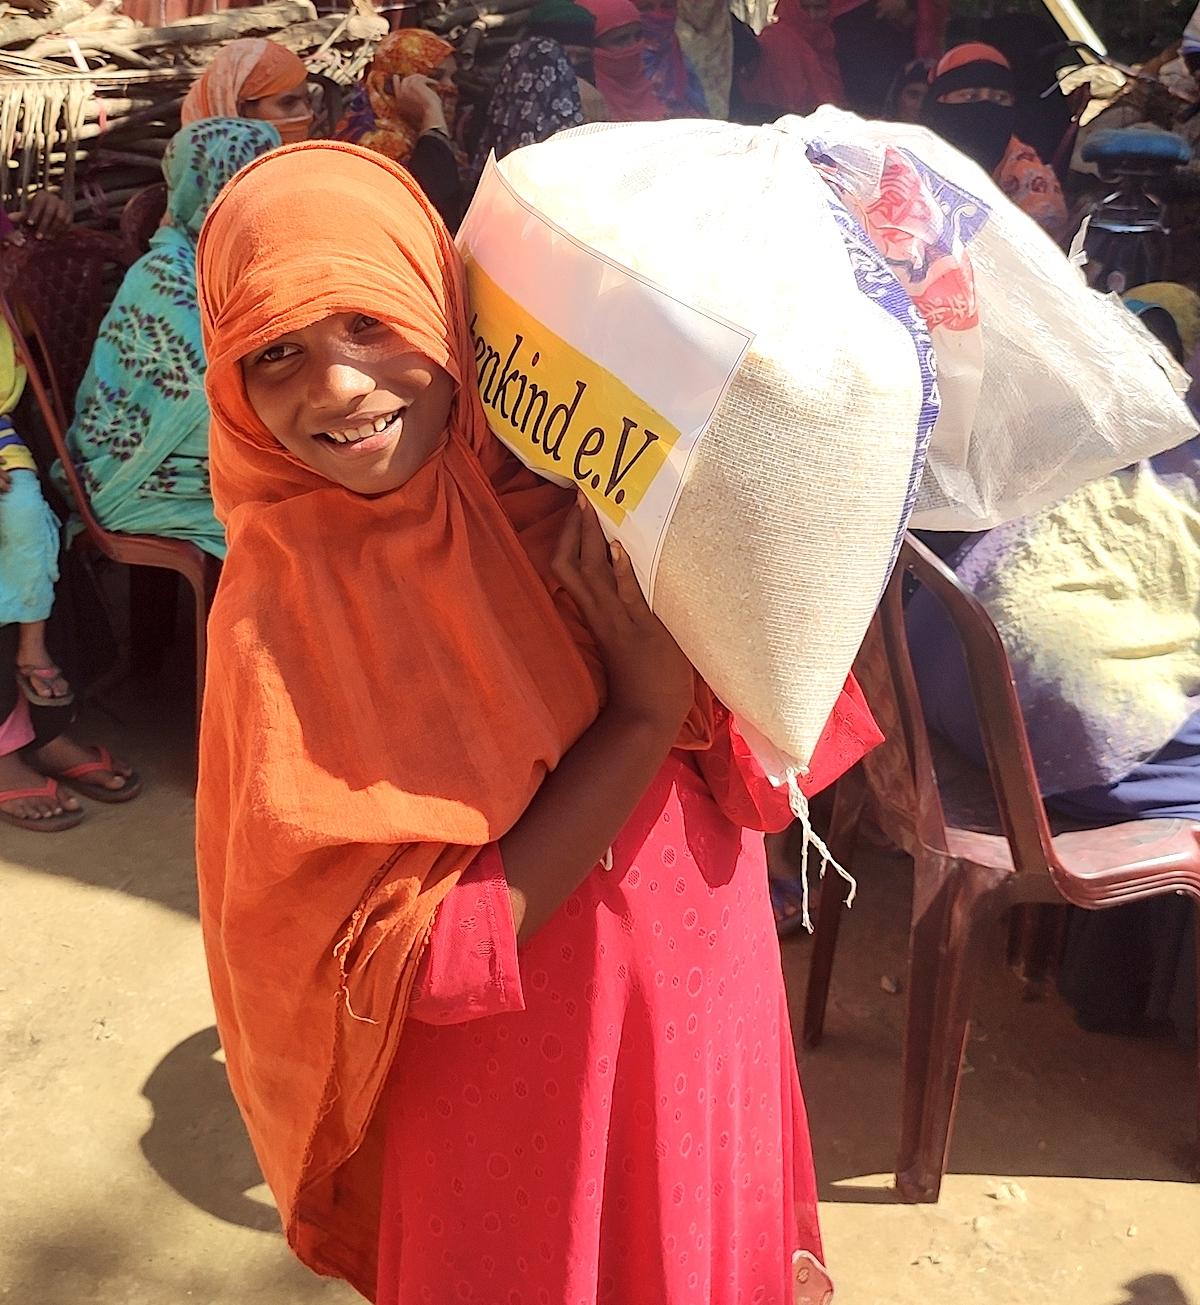 Reisverteilung an Rohingya